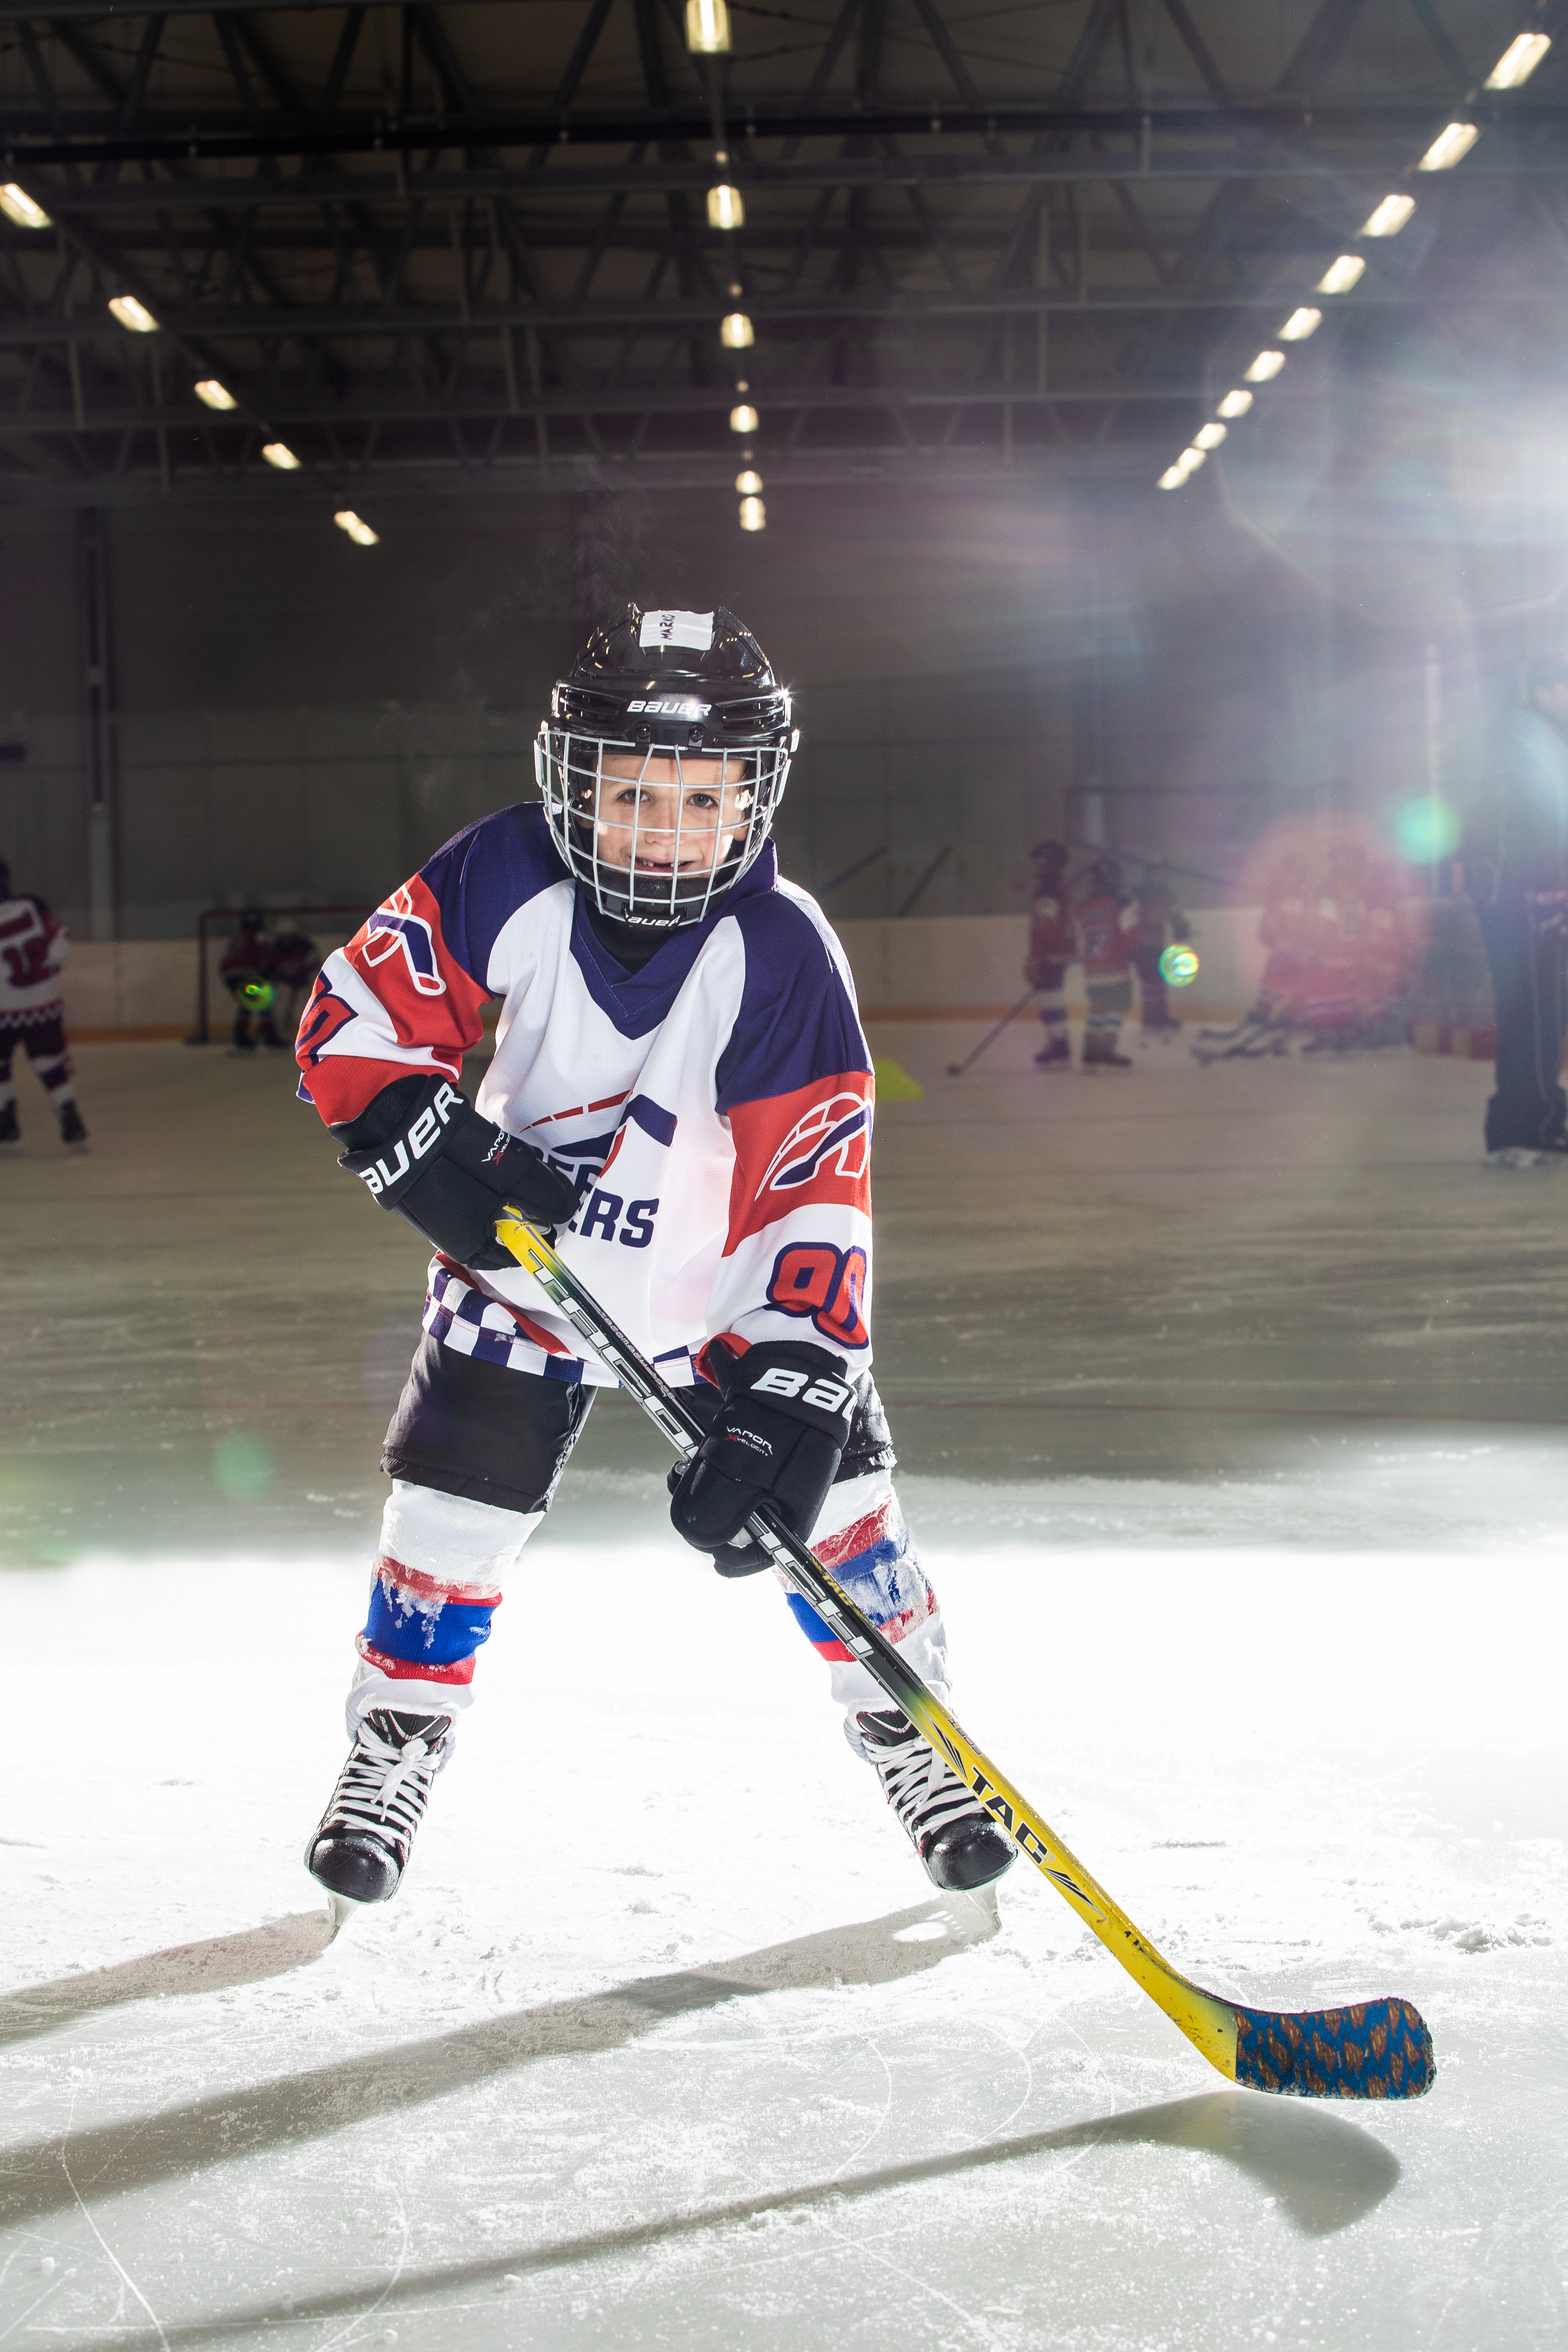 Marco Dugovic Speeders Bratislava cislo 38 hokej